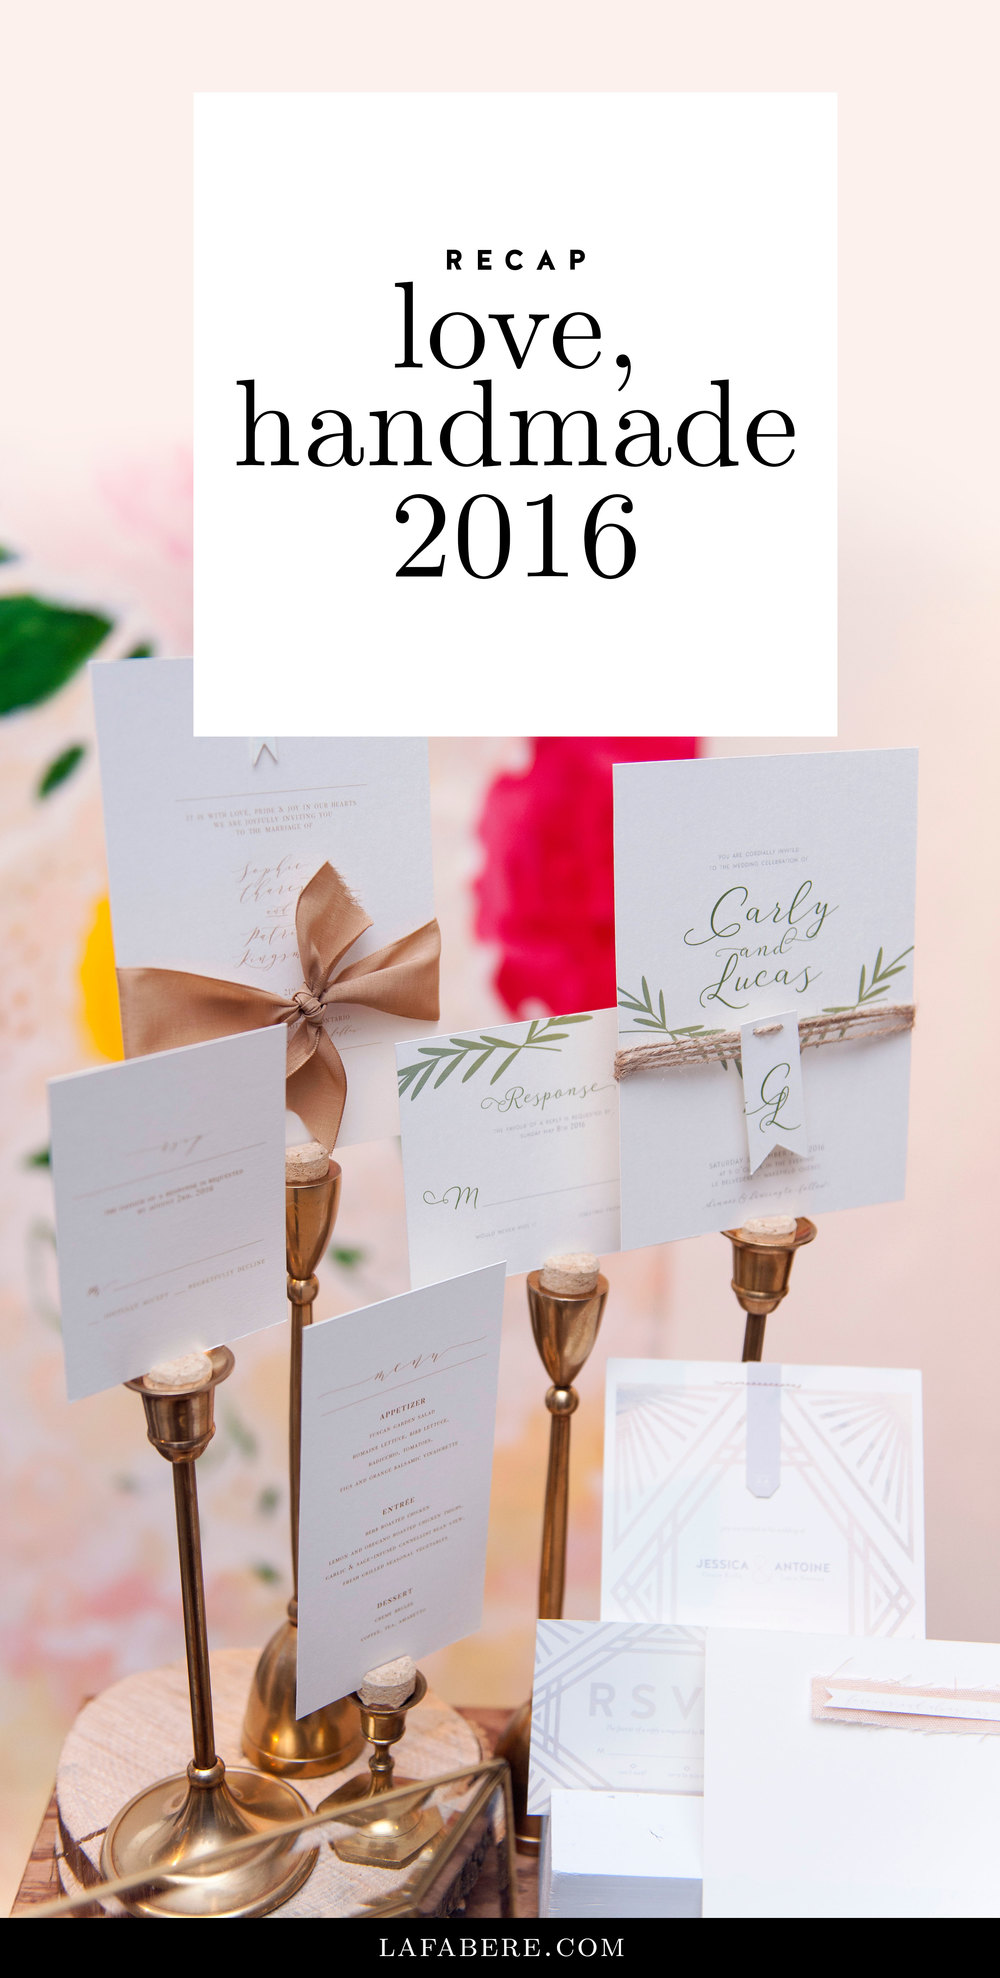 LaFabere Love, handmade 2016 recap